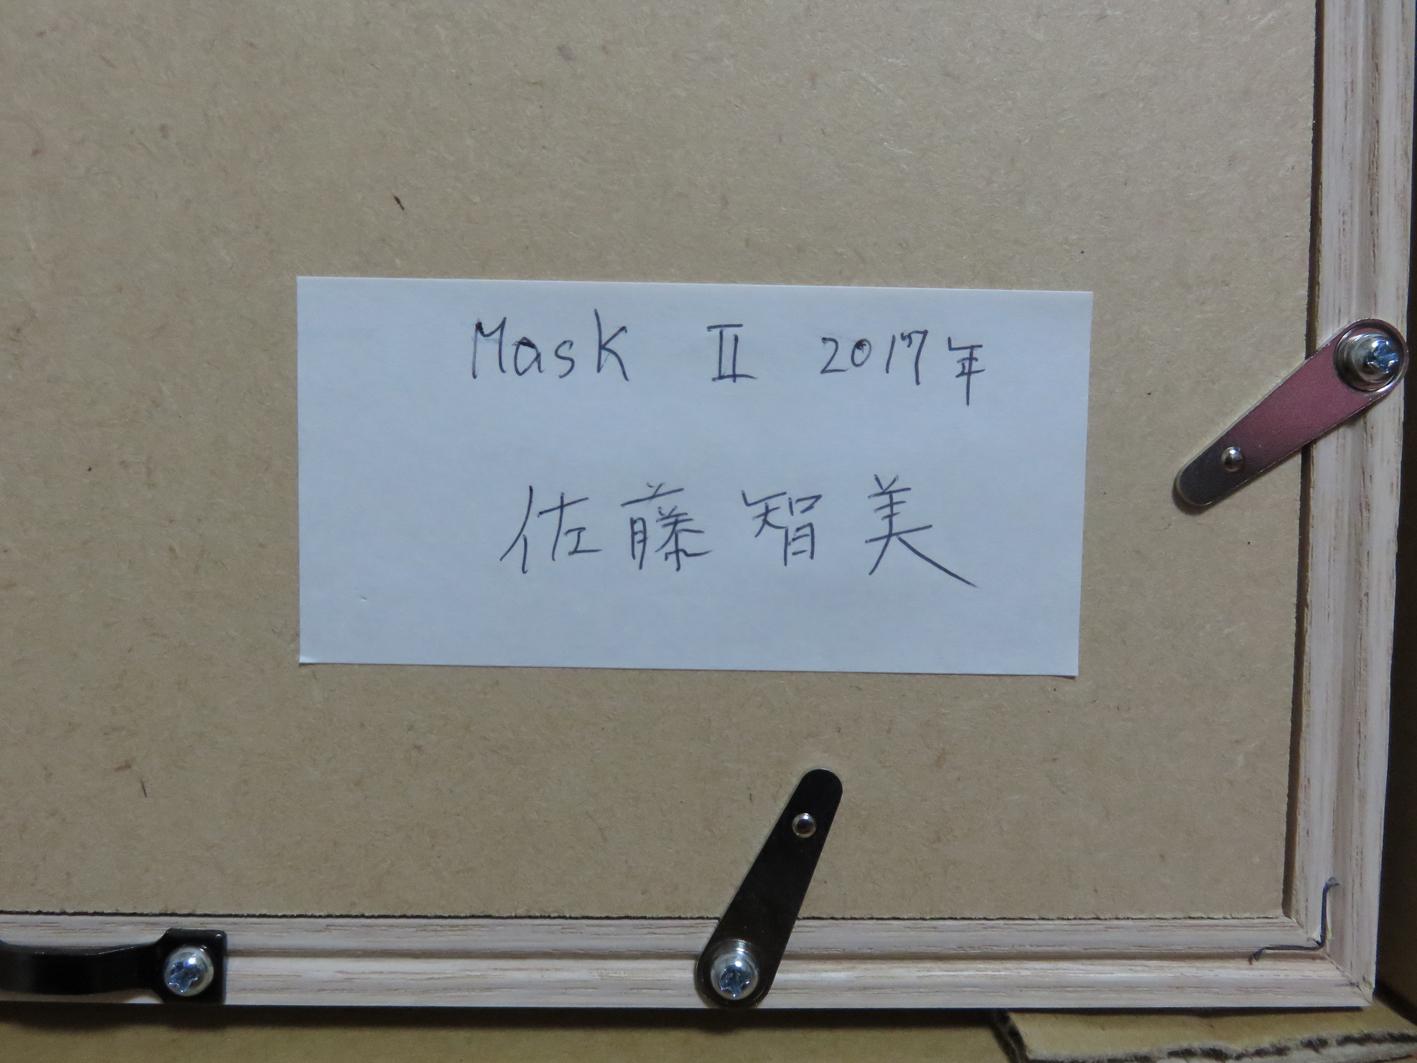 MASK Ⅱ